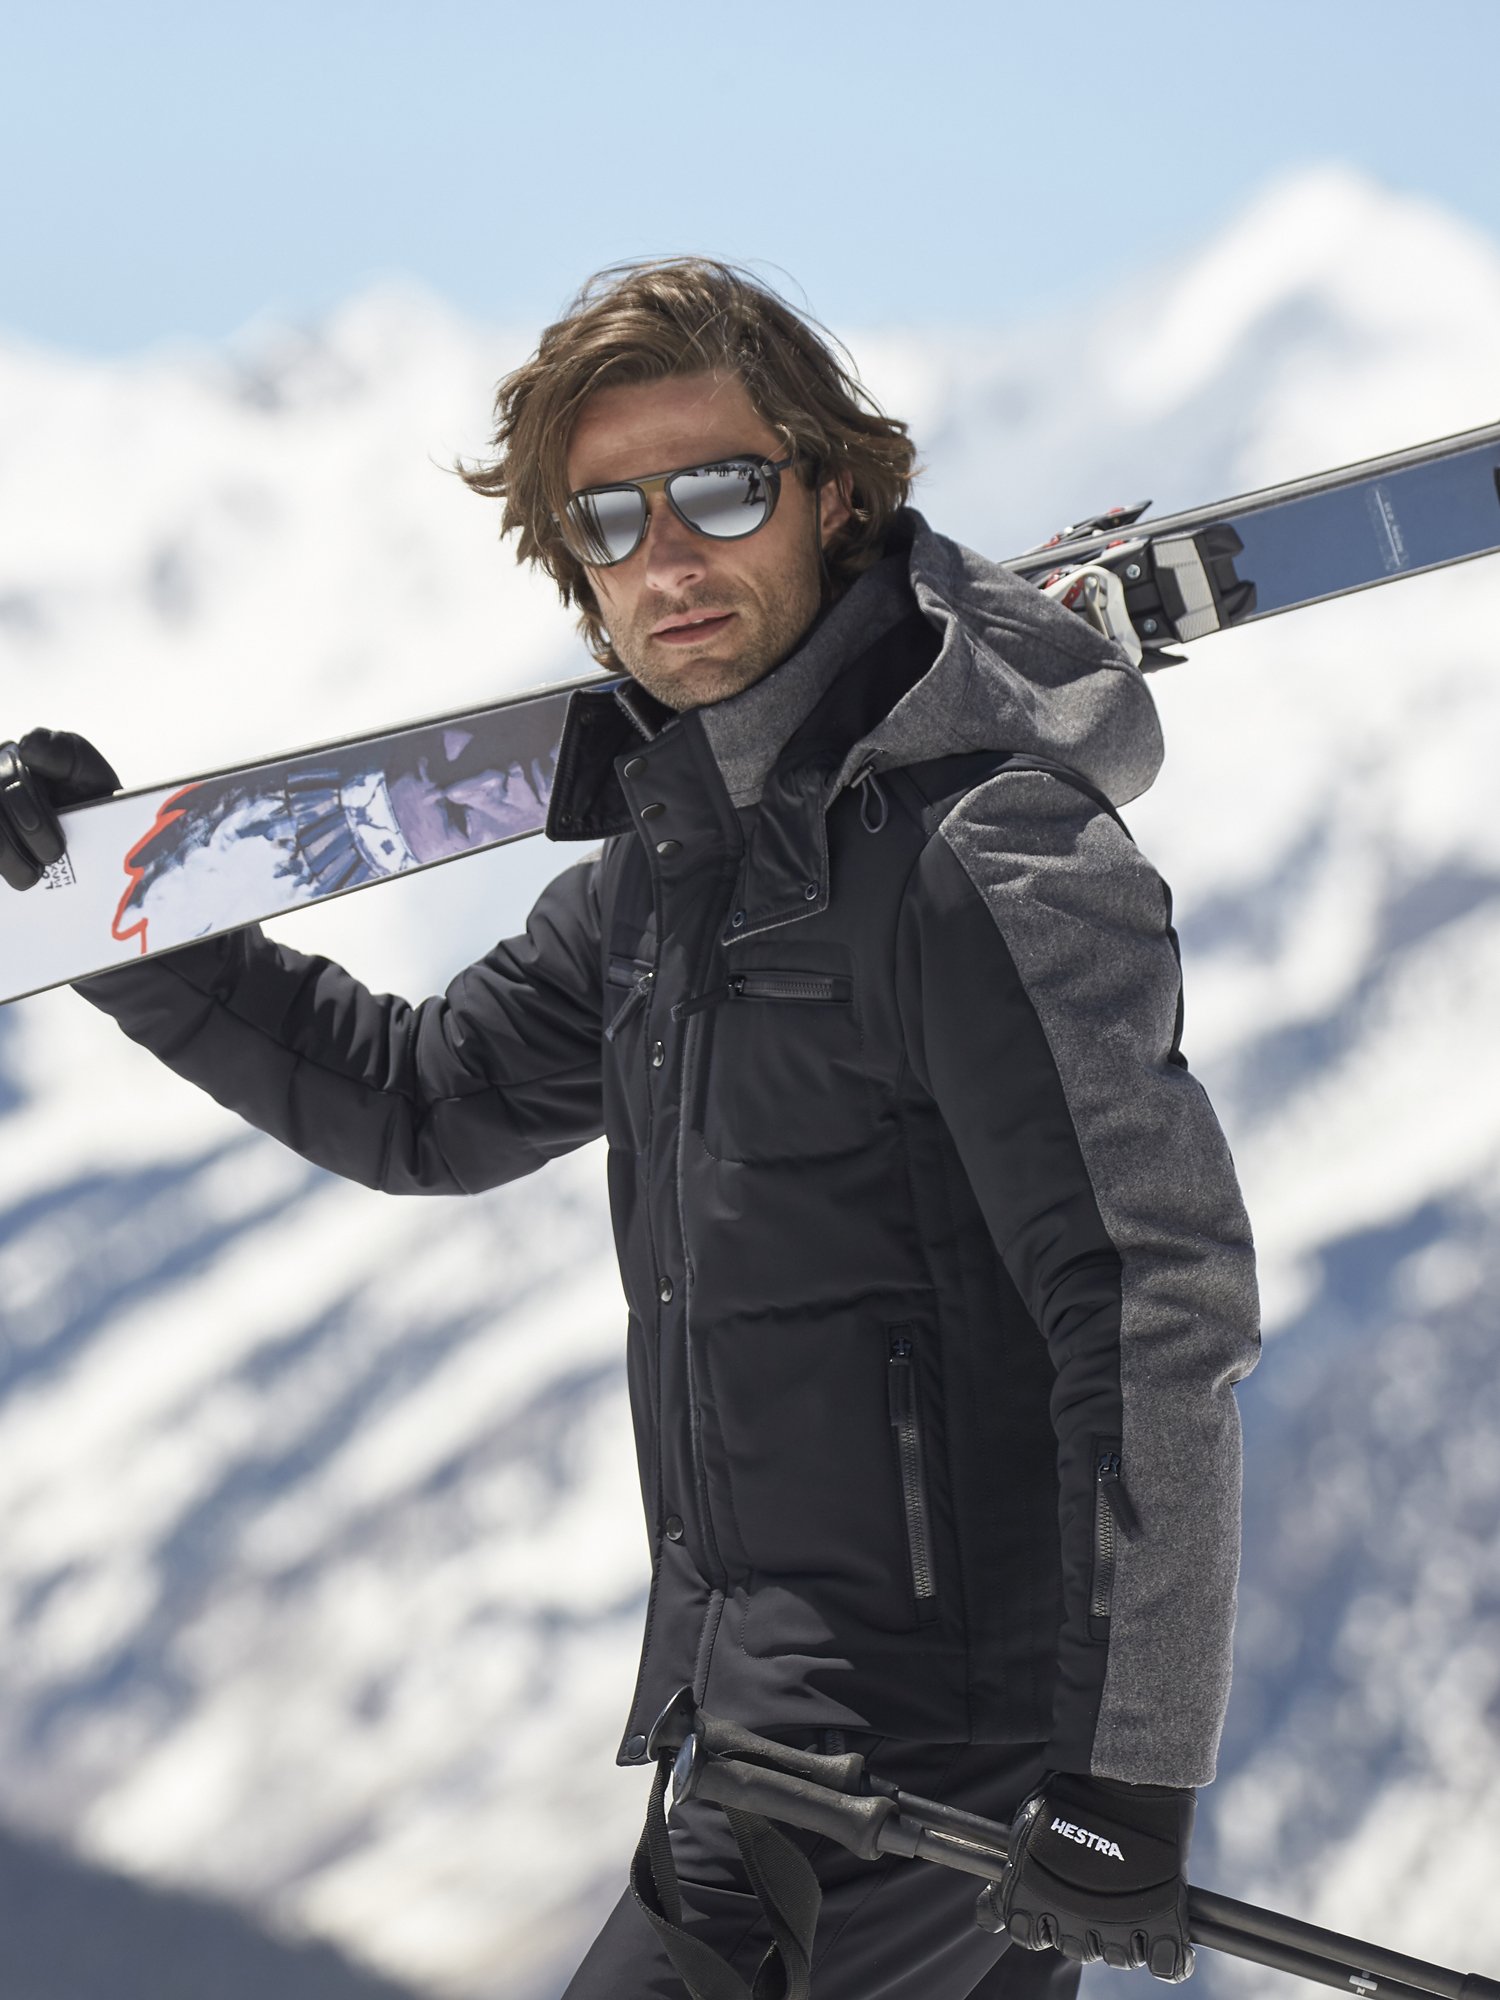 Blue One Size Neck Tie Italian Mens Jet Ski Water Sports Skiing Necktie